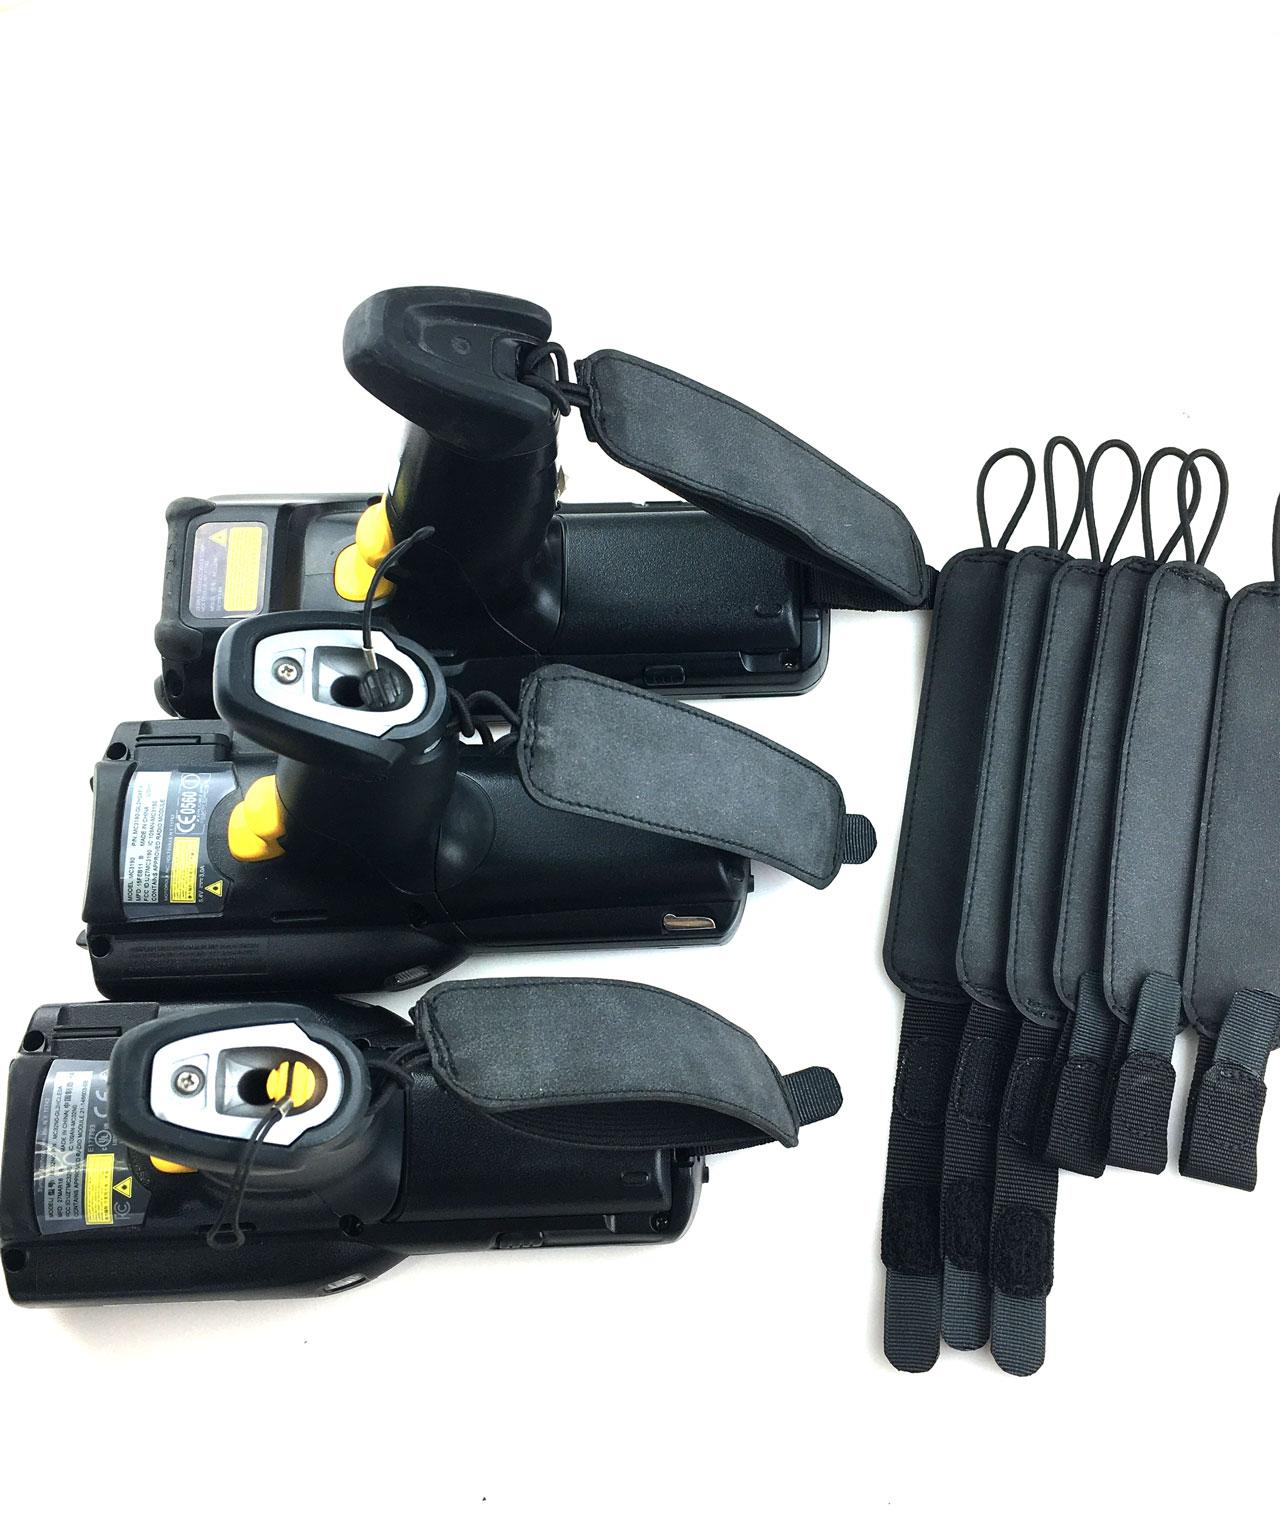 mc330-mc32n0-mc3190-hand-strap-remeshok